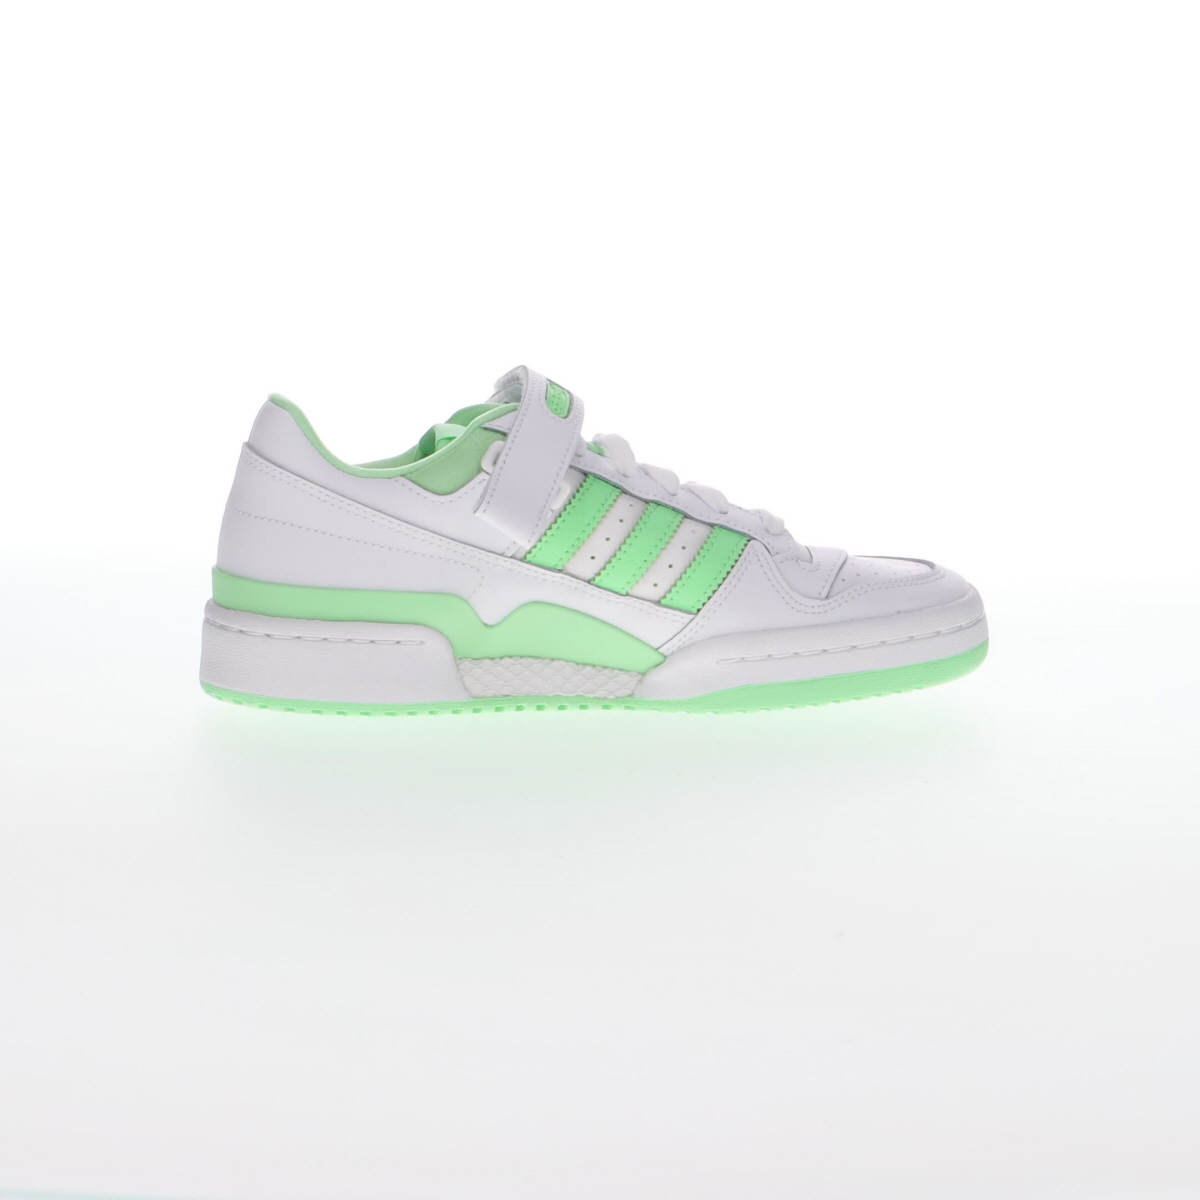 bruce smith nike shoes kids size 6